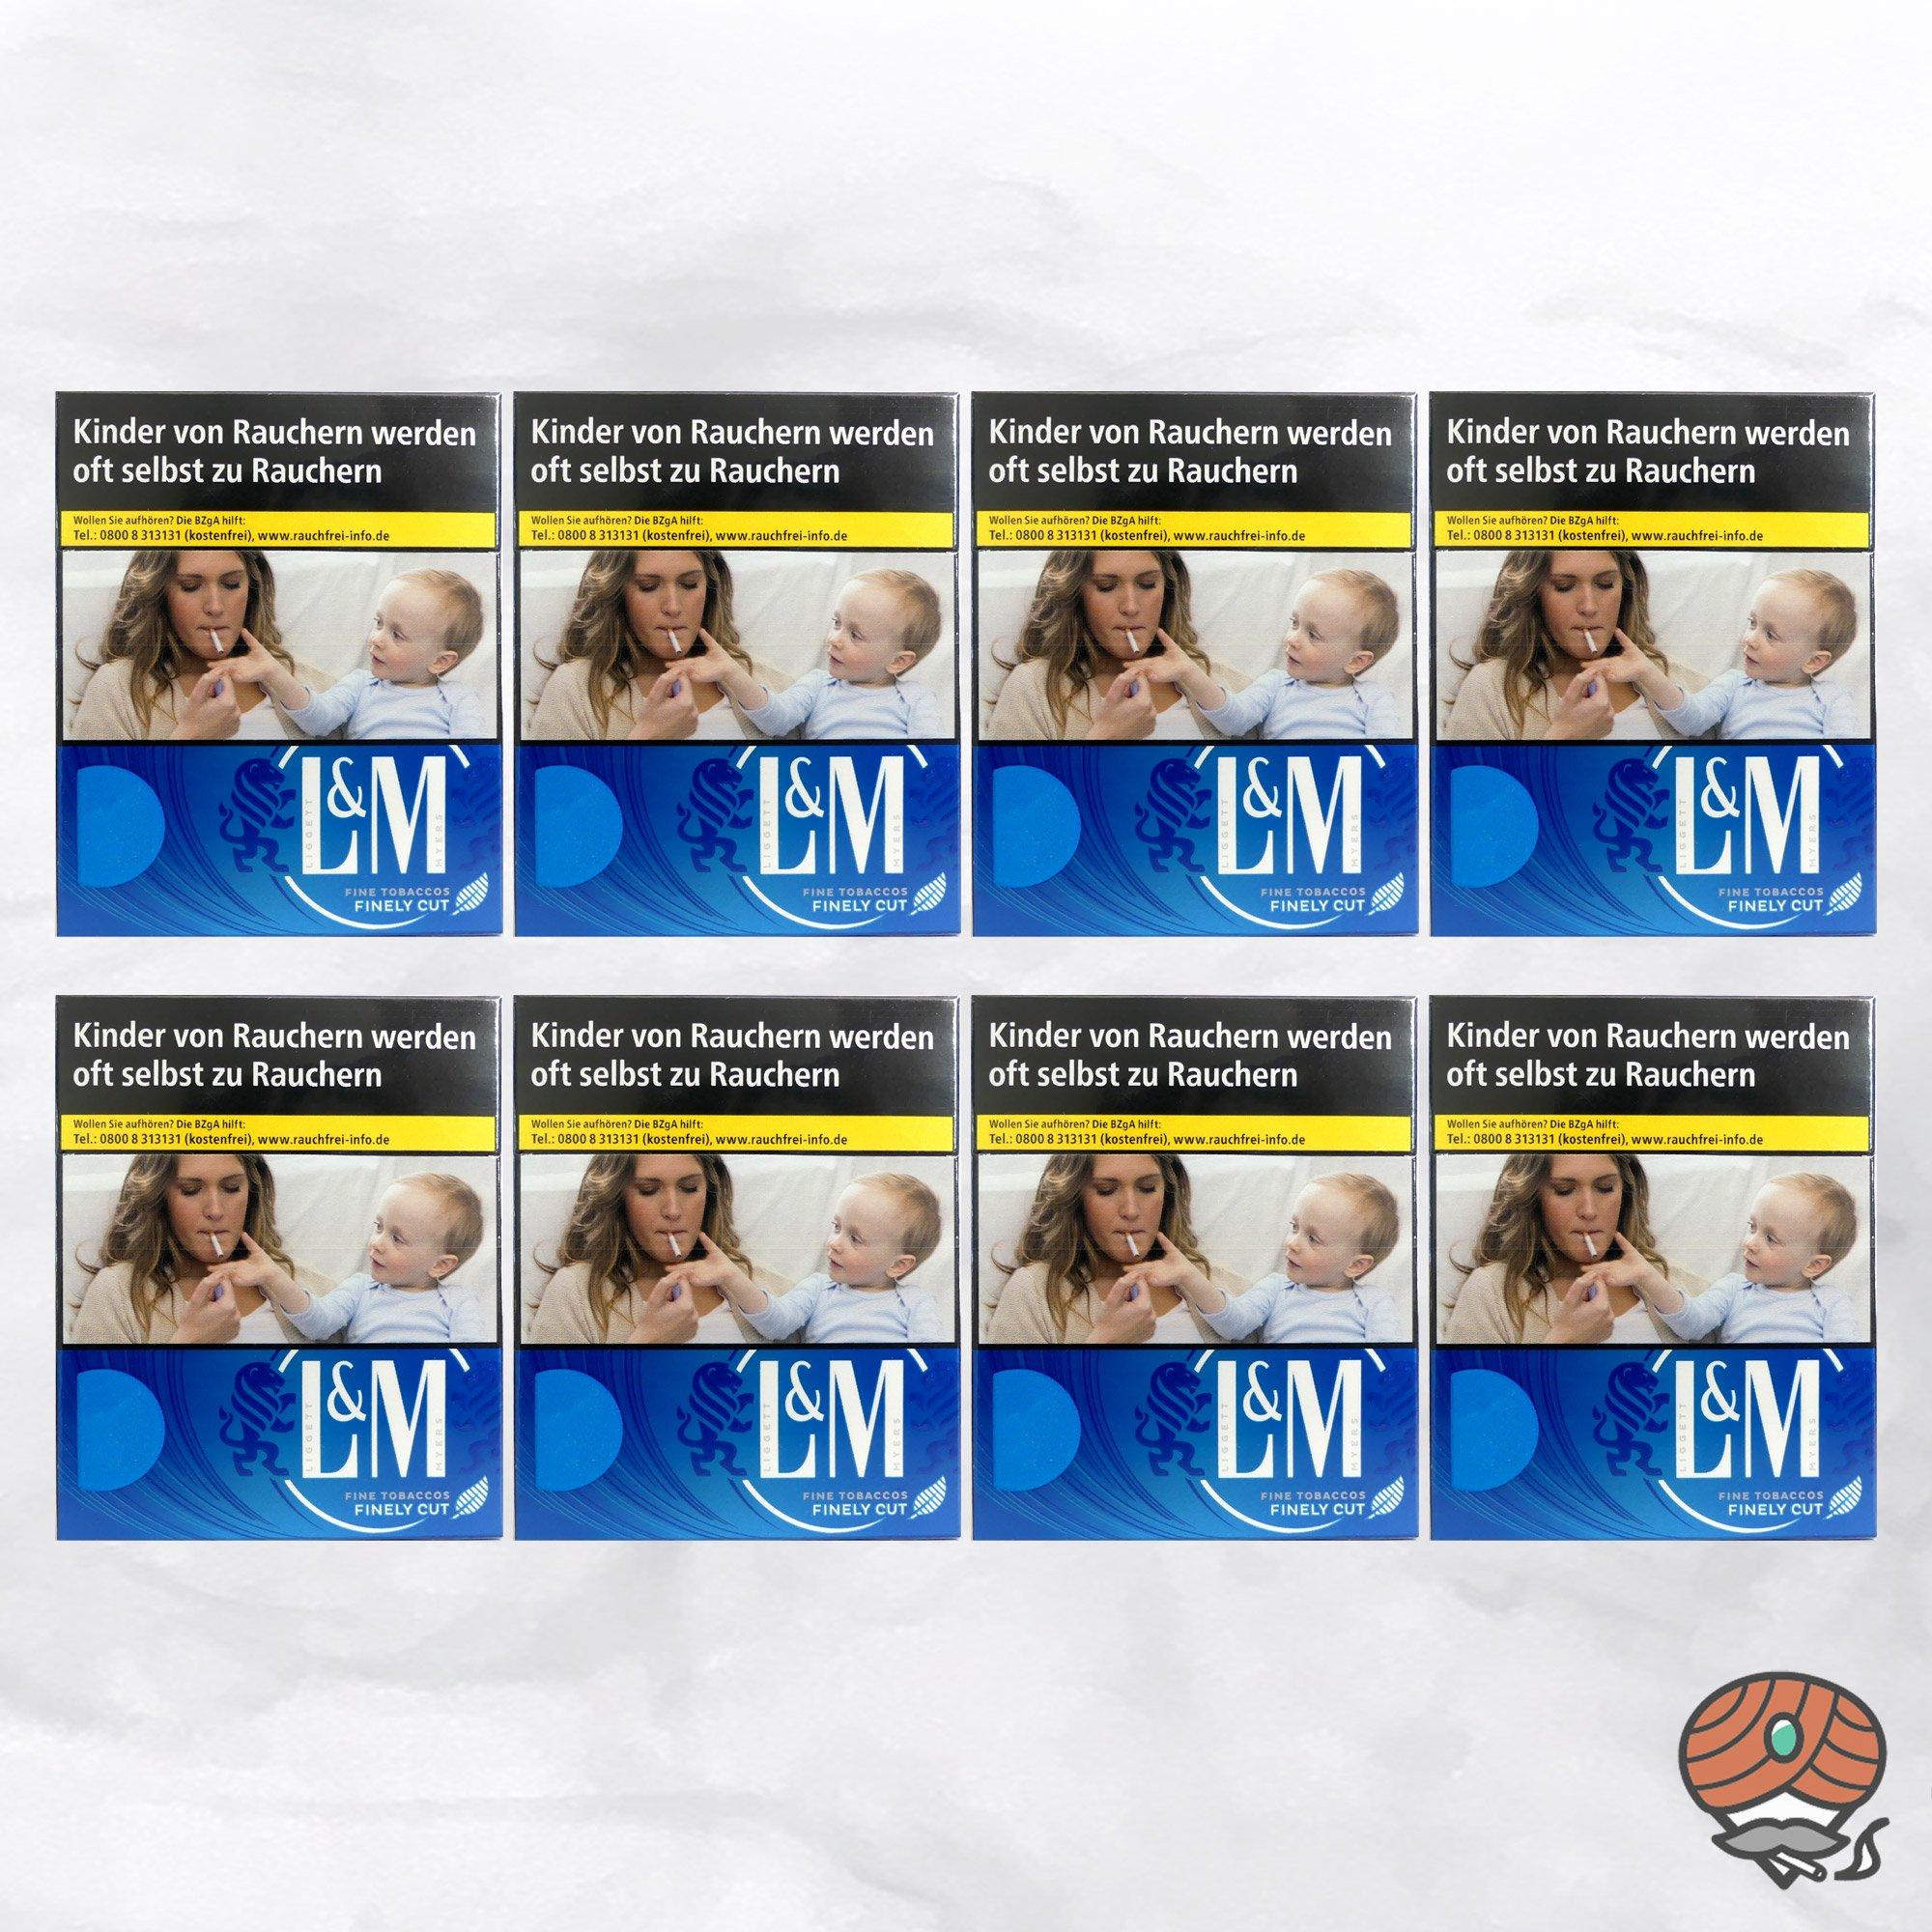 1 Stange L&M Blue Label XXXL Inhalt 8 x 34 Stück